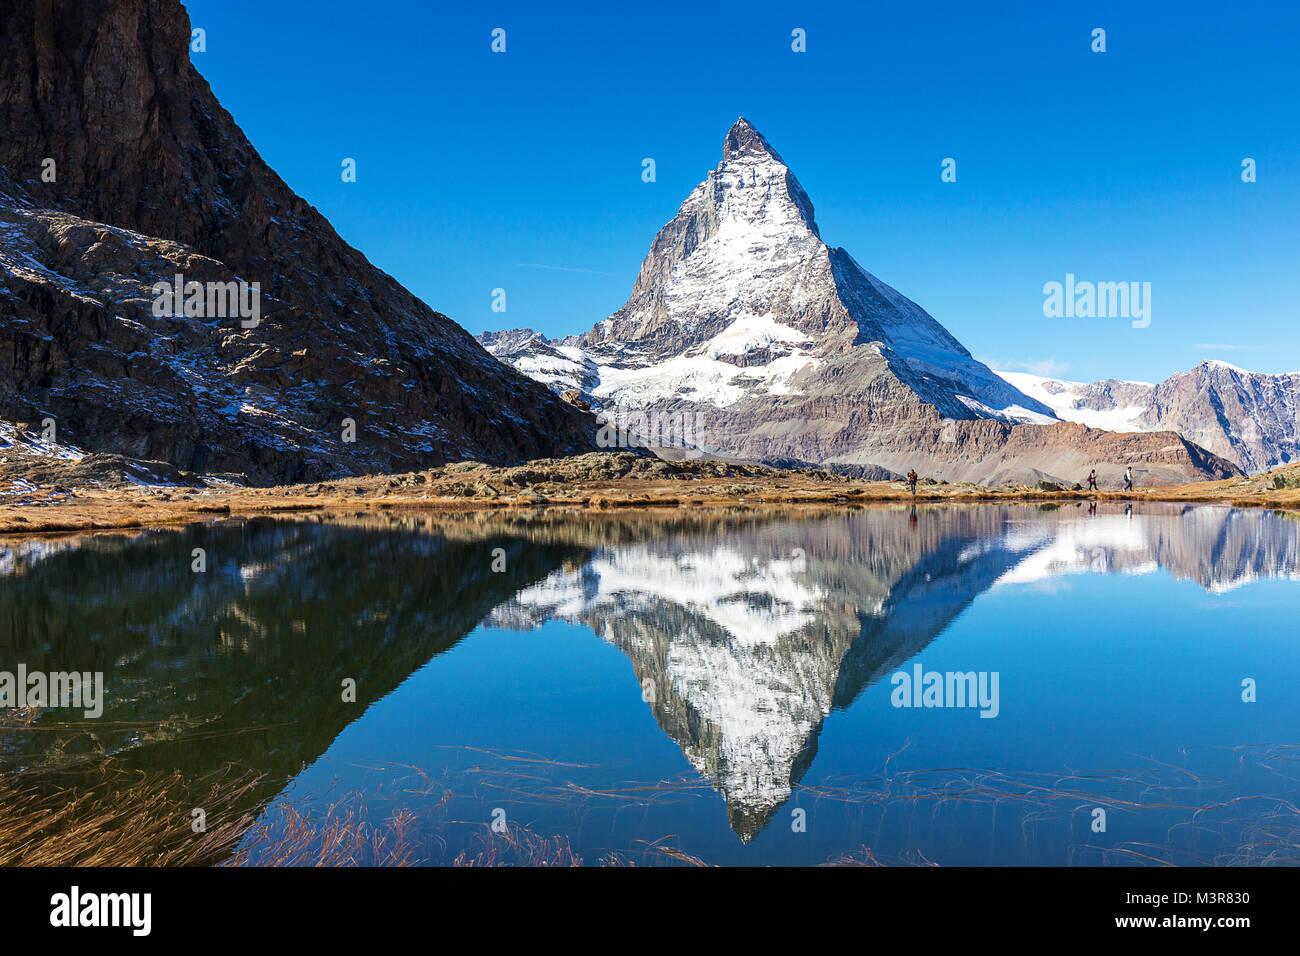 Matterhorn mountain view from Riffelsee lake, locate between Gornergrat train station, on high mountain in Zermatt, - Stock Image